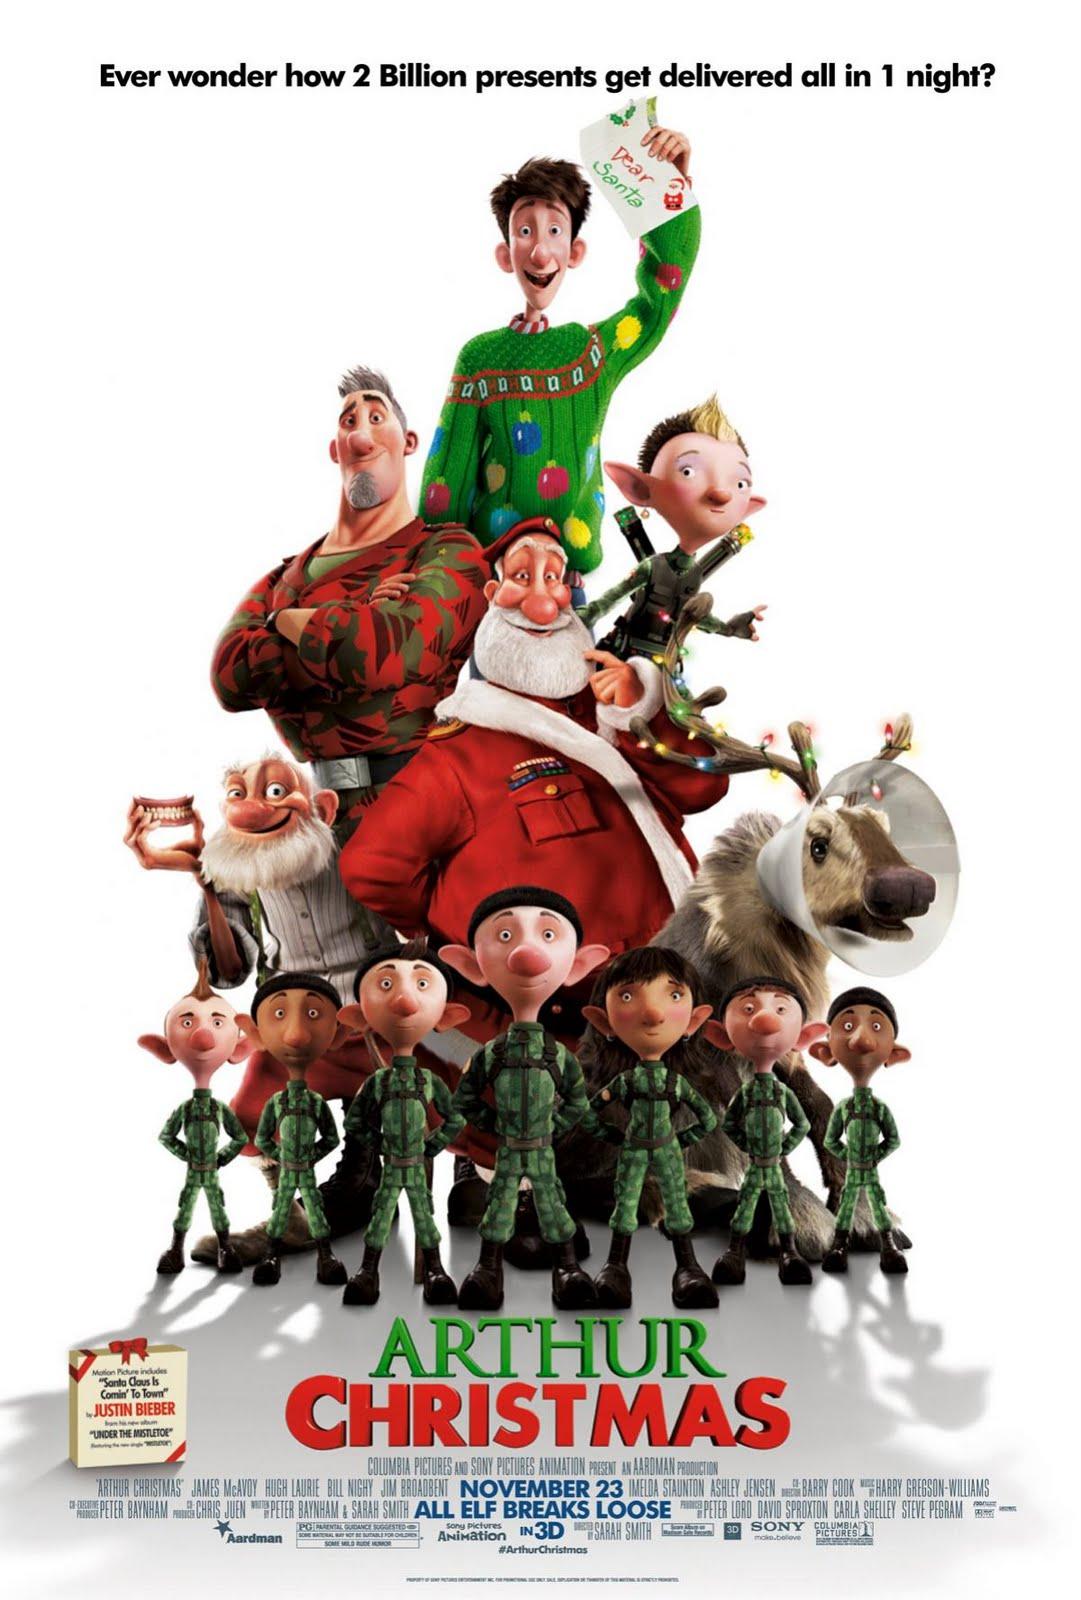 http://2.bp.blogspot.com/-AiH1Eh88yjI/T0pLIRIU7_I/AAAAAAAAAQM/MBvvNkeSOlc/s1600/Arthur-Christmas-poster.jpg